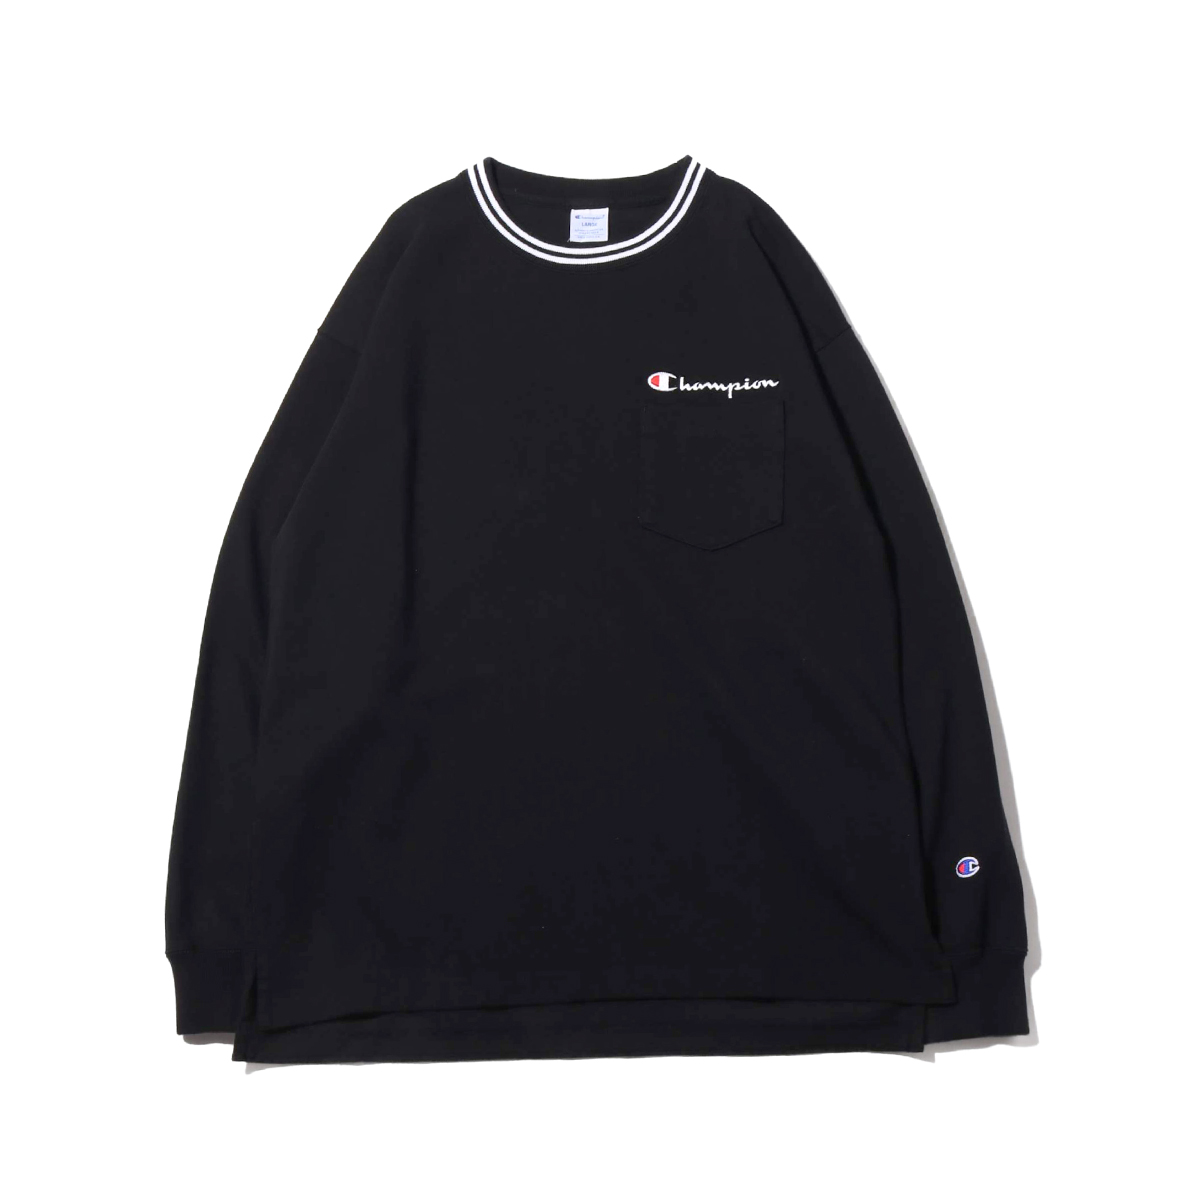 Champion LONG SLEEVE T-SHIRT(ブラック)(チャンピオン ロングスリーブ ティーシャツ)【メンズ】【長袖Tシャツ】【19FW-I】